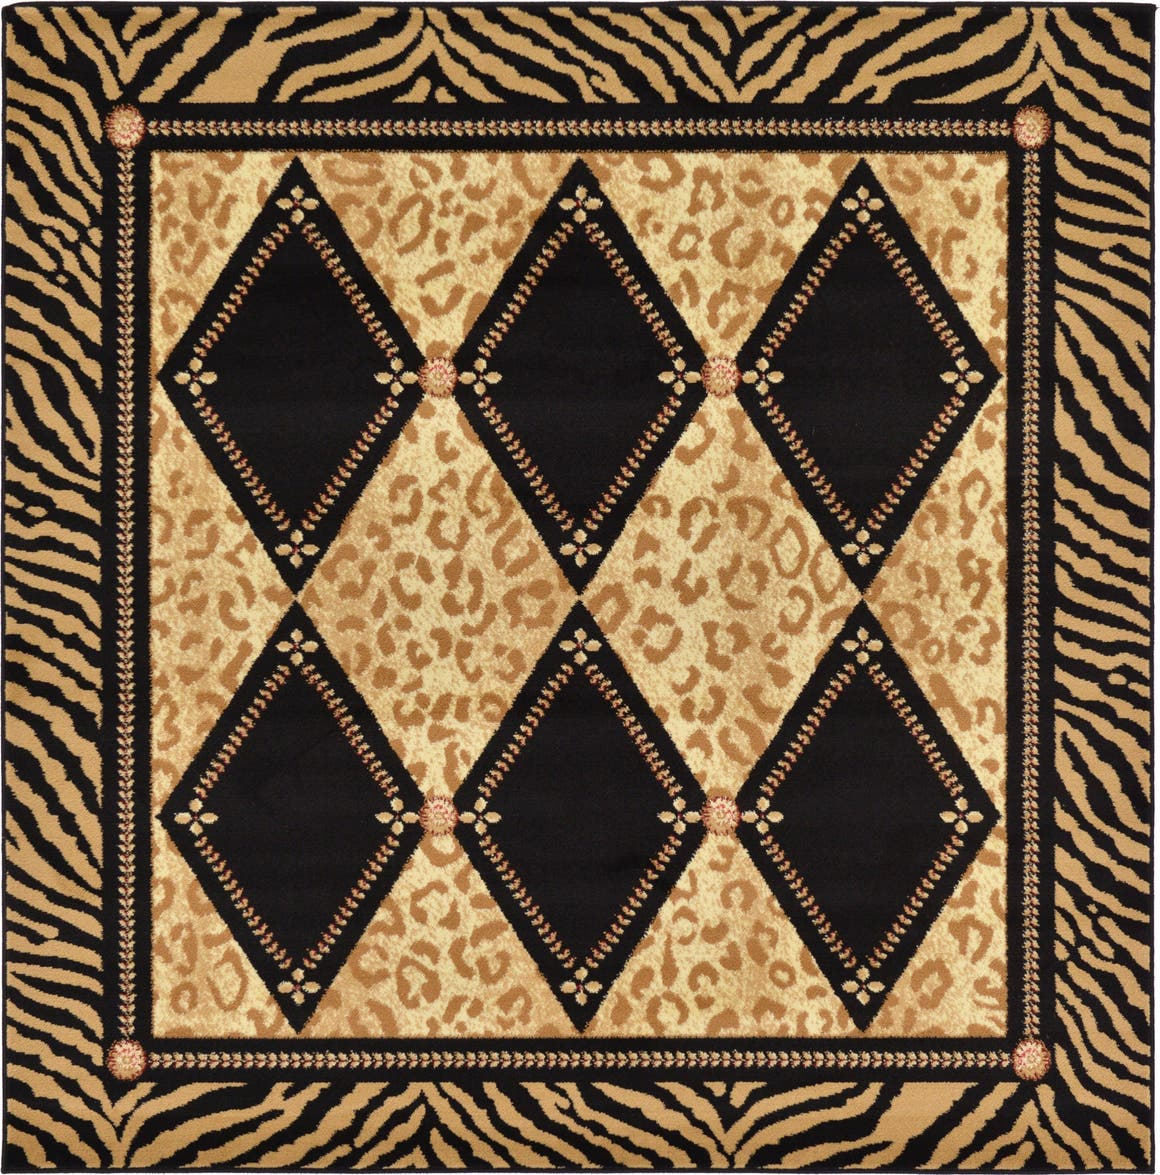 6' x 6' Safari Square Rug main image